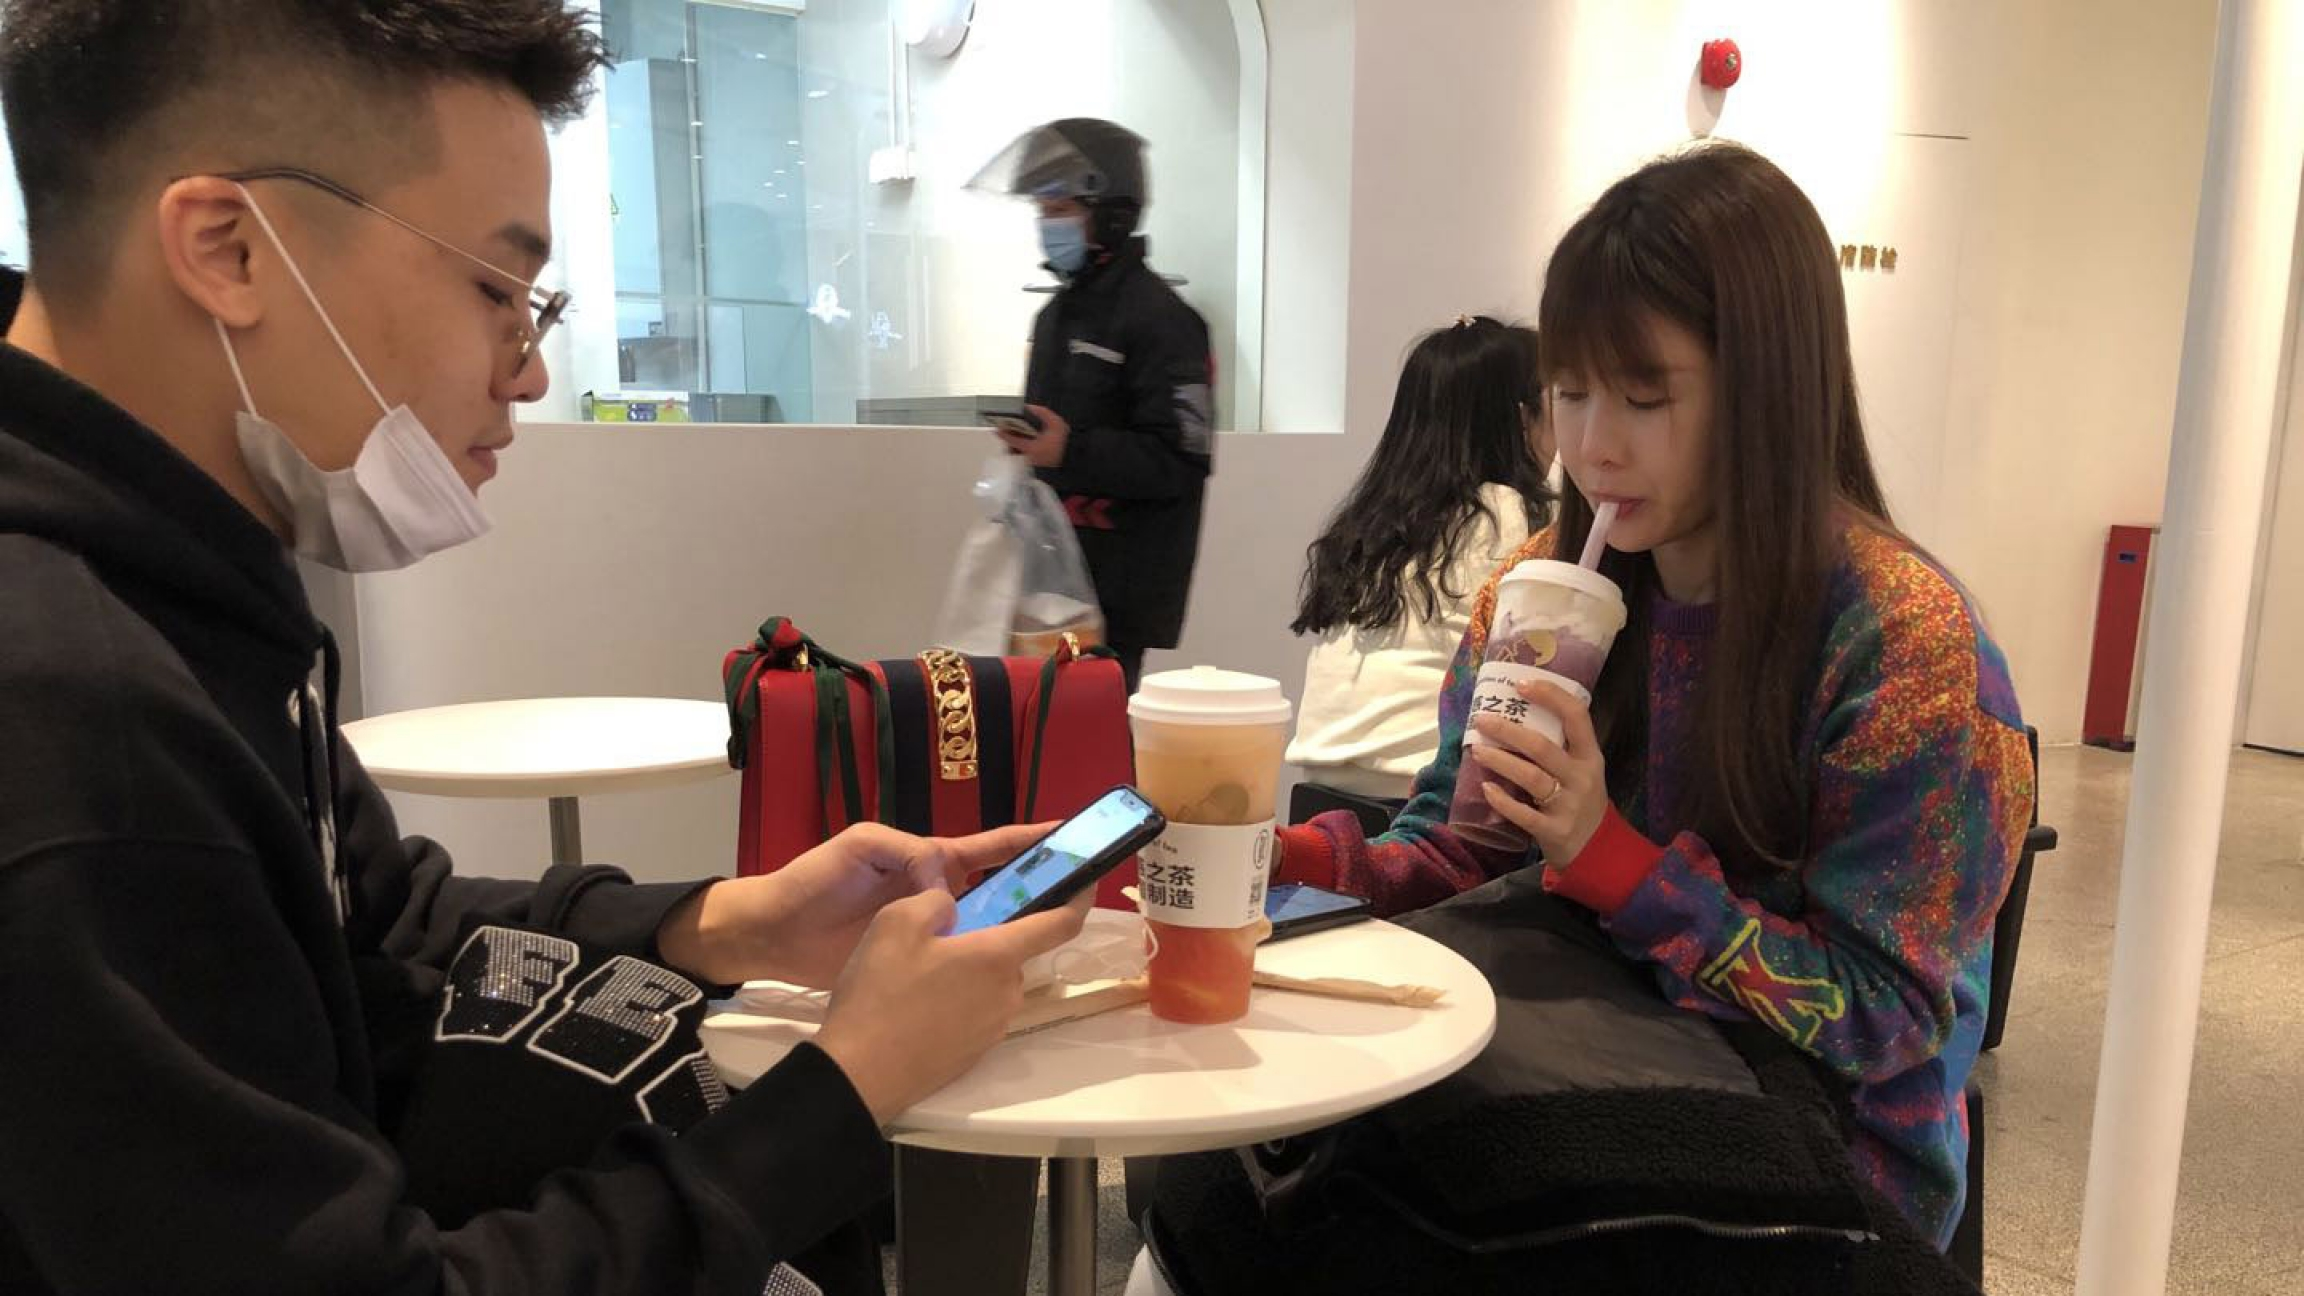 Two people enjoy bubble tea.